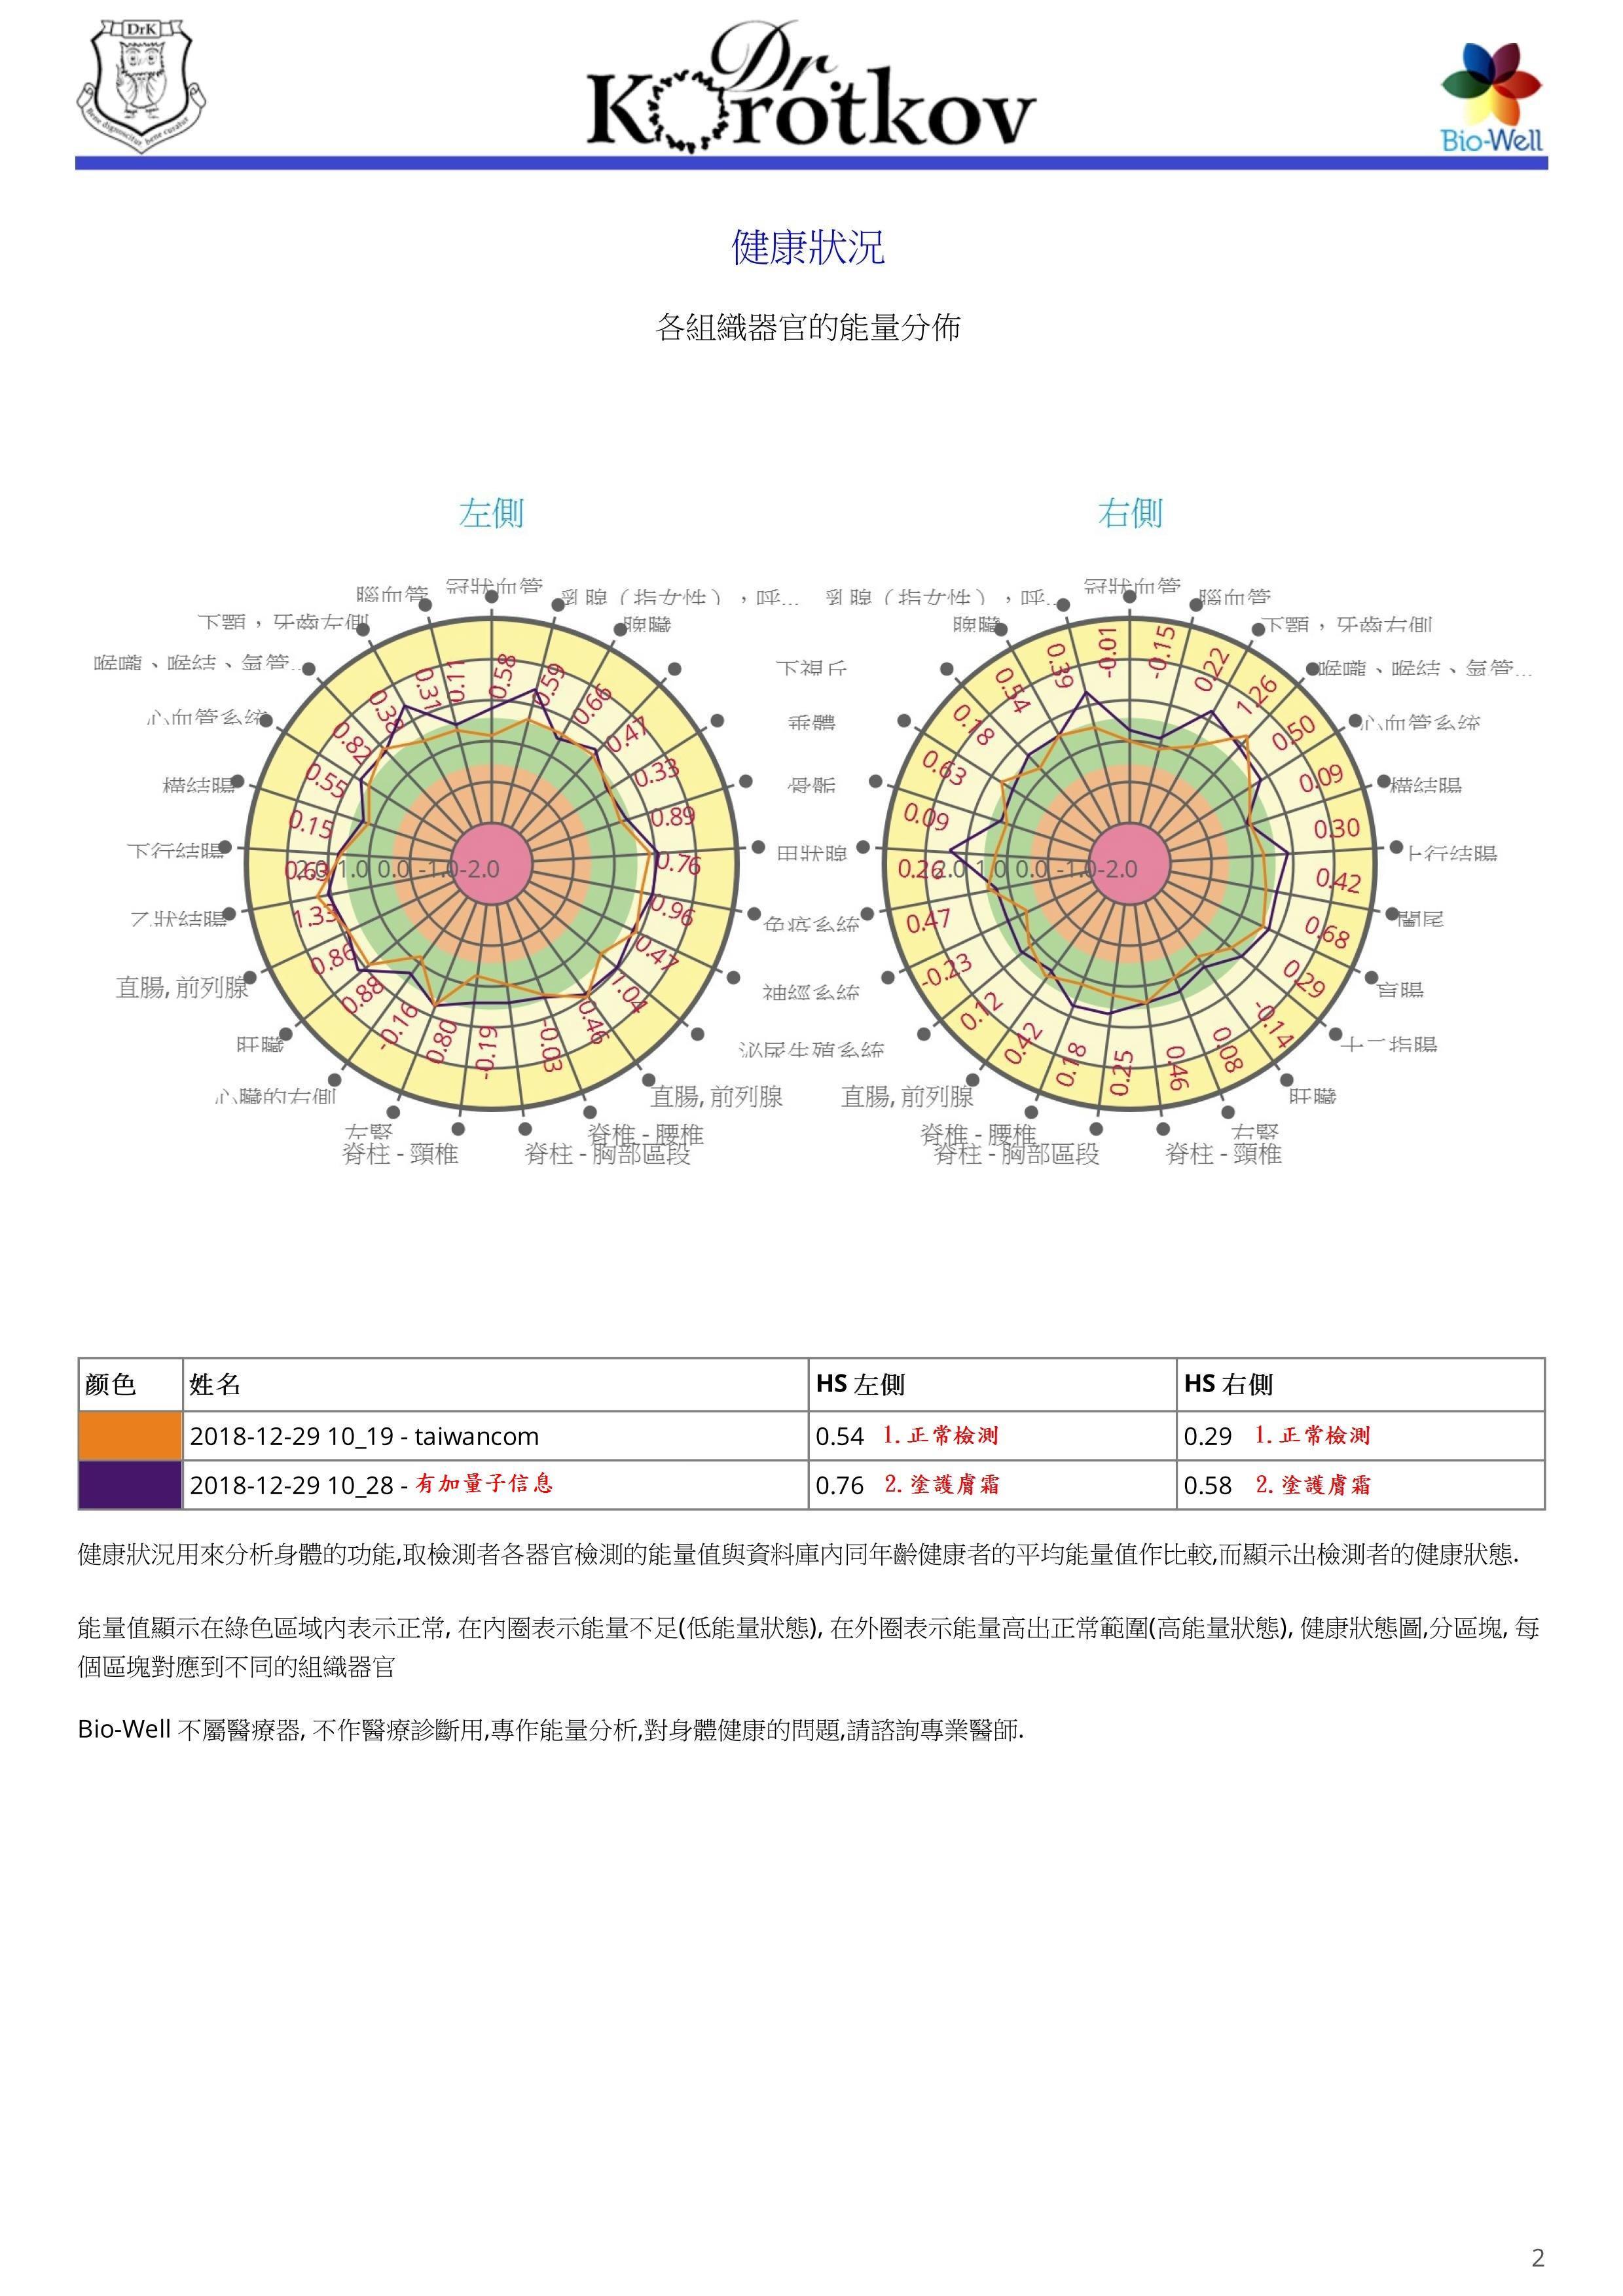 http://taiwancom.tw/images/bio-6-4.jpg